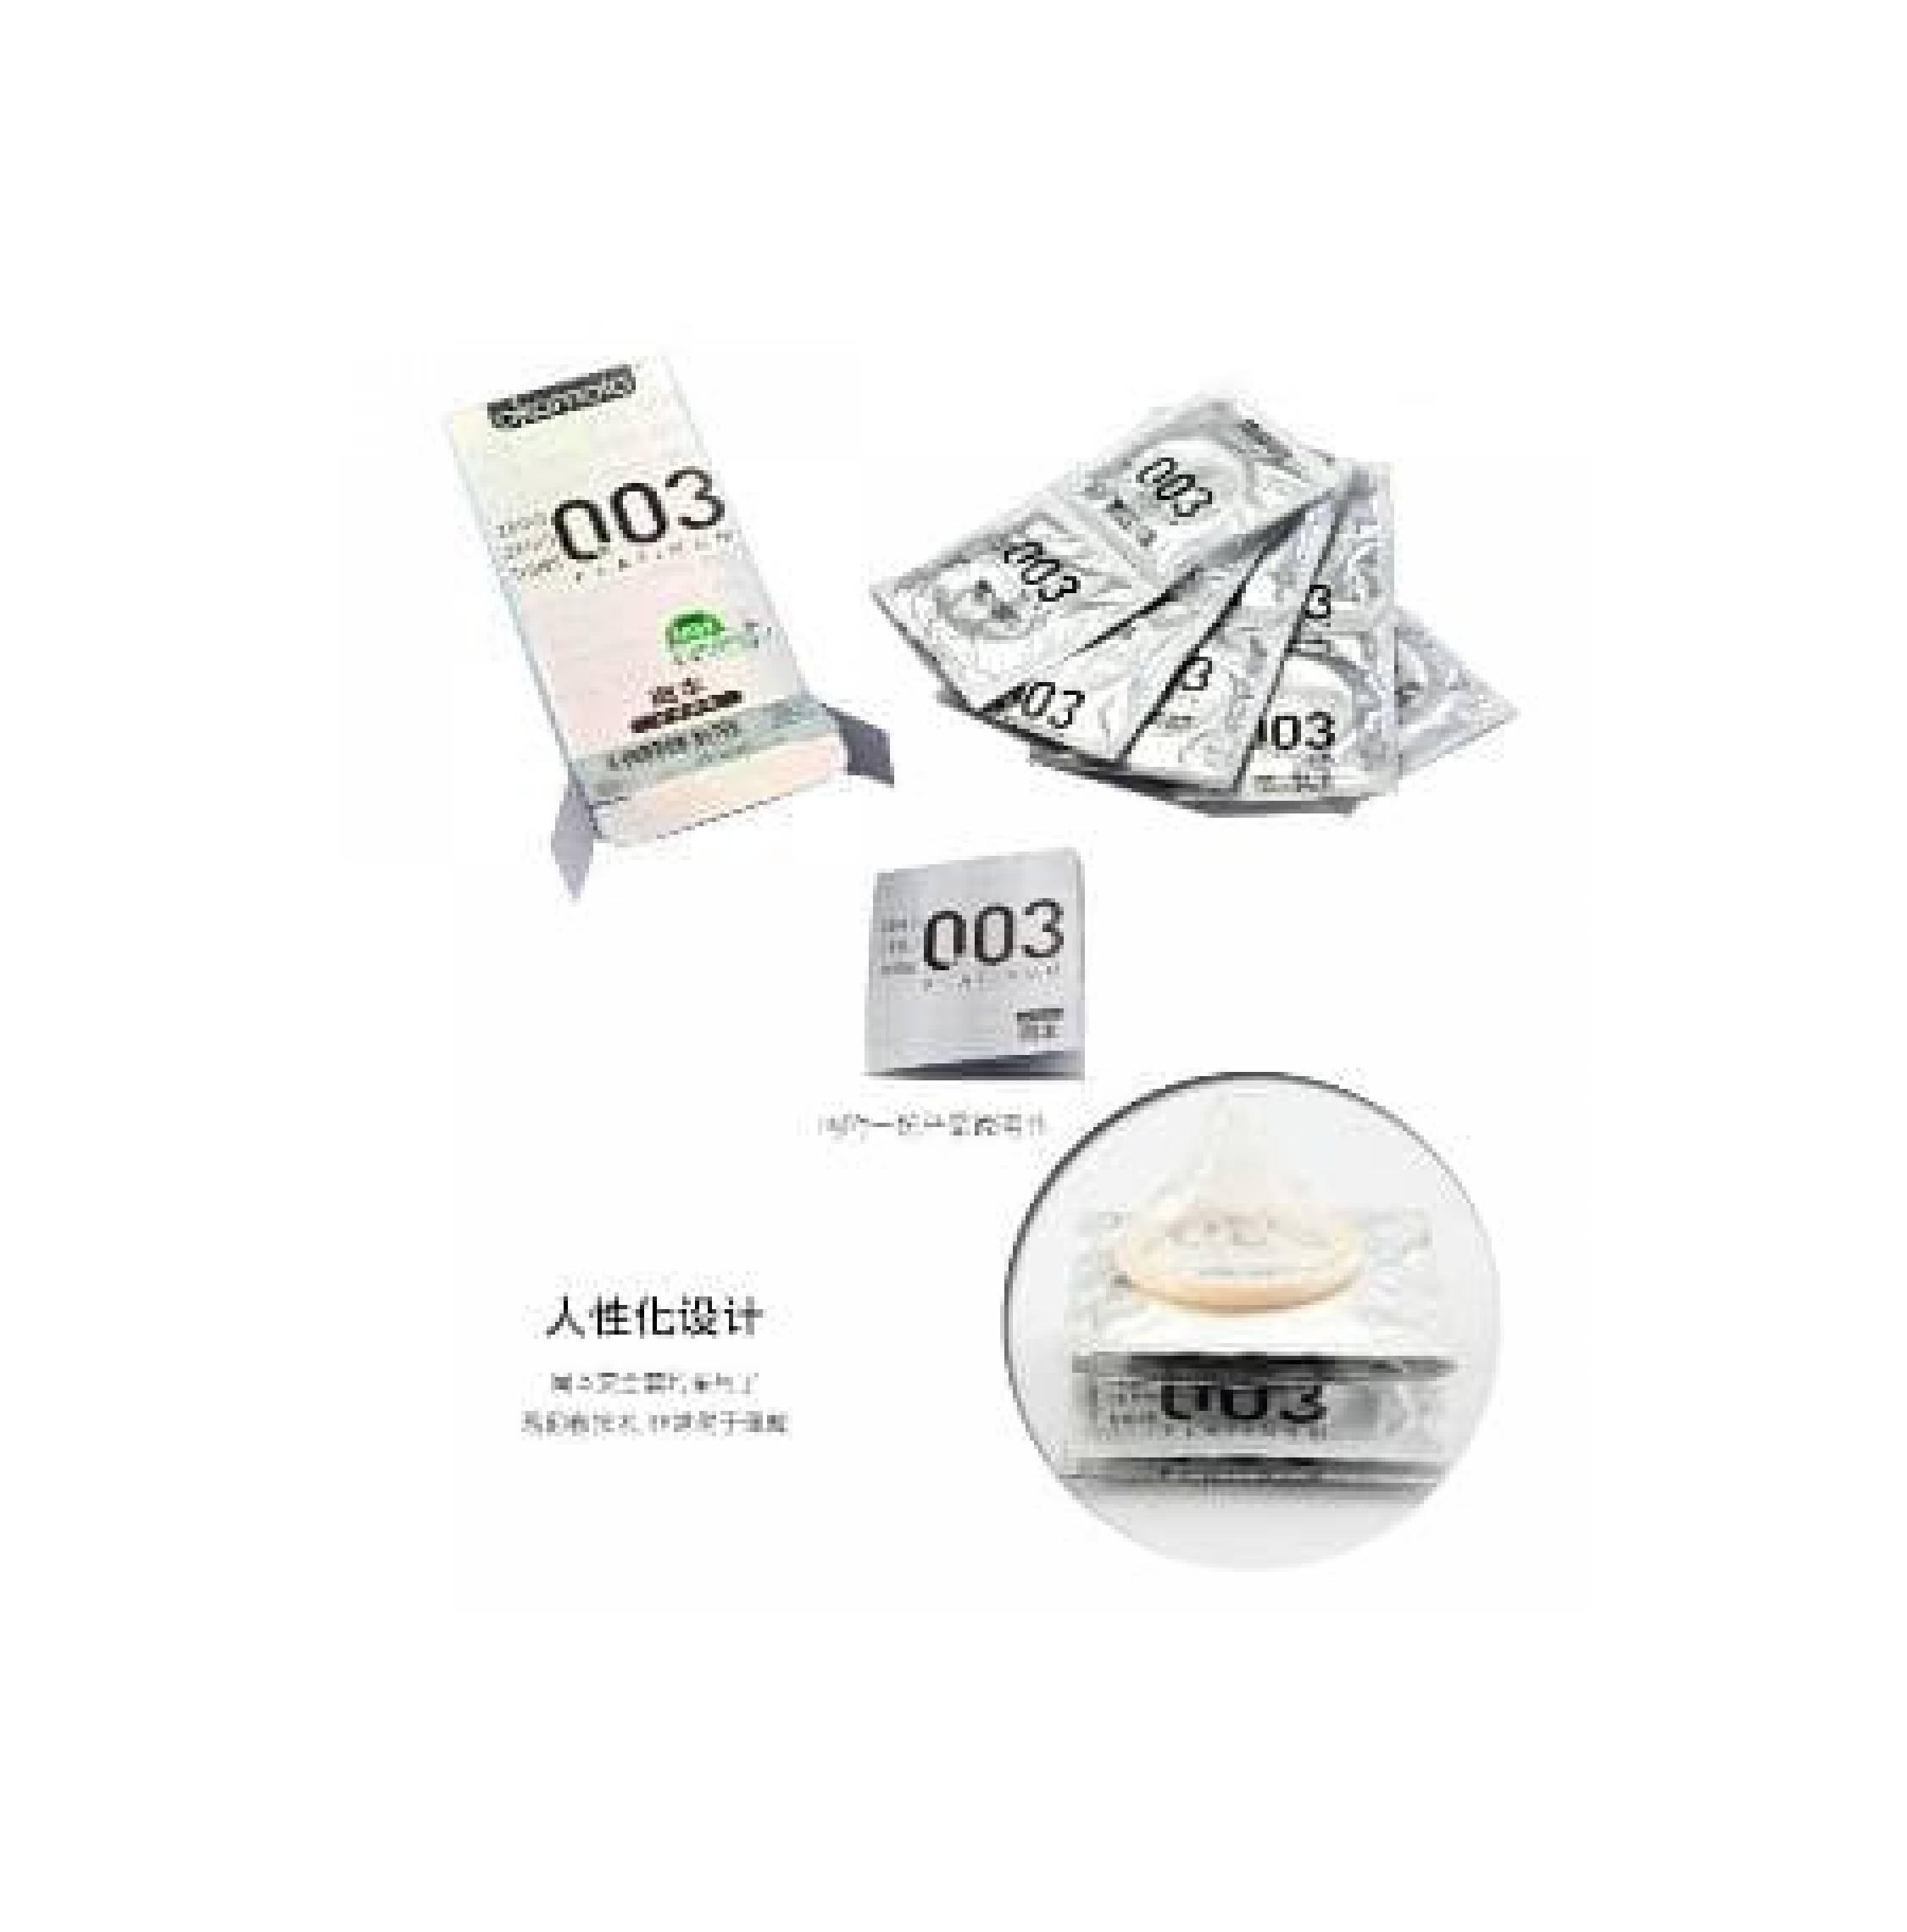 Buy Sell Cheapest Okamoto 003 Best Quality Product Deals Vibra Ribbed Kondom Tipis Bergerigi Jepang Made In Japan Promo